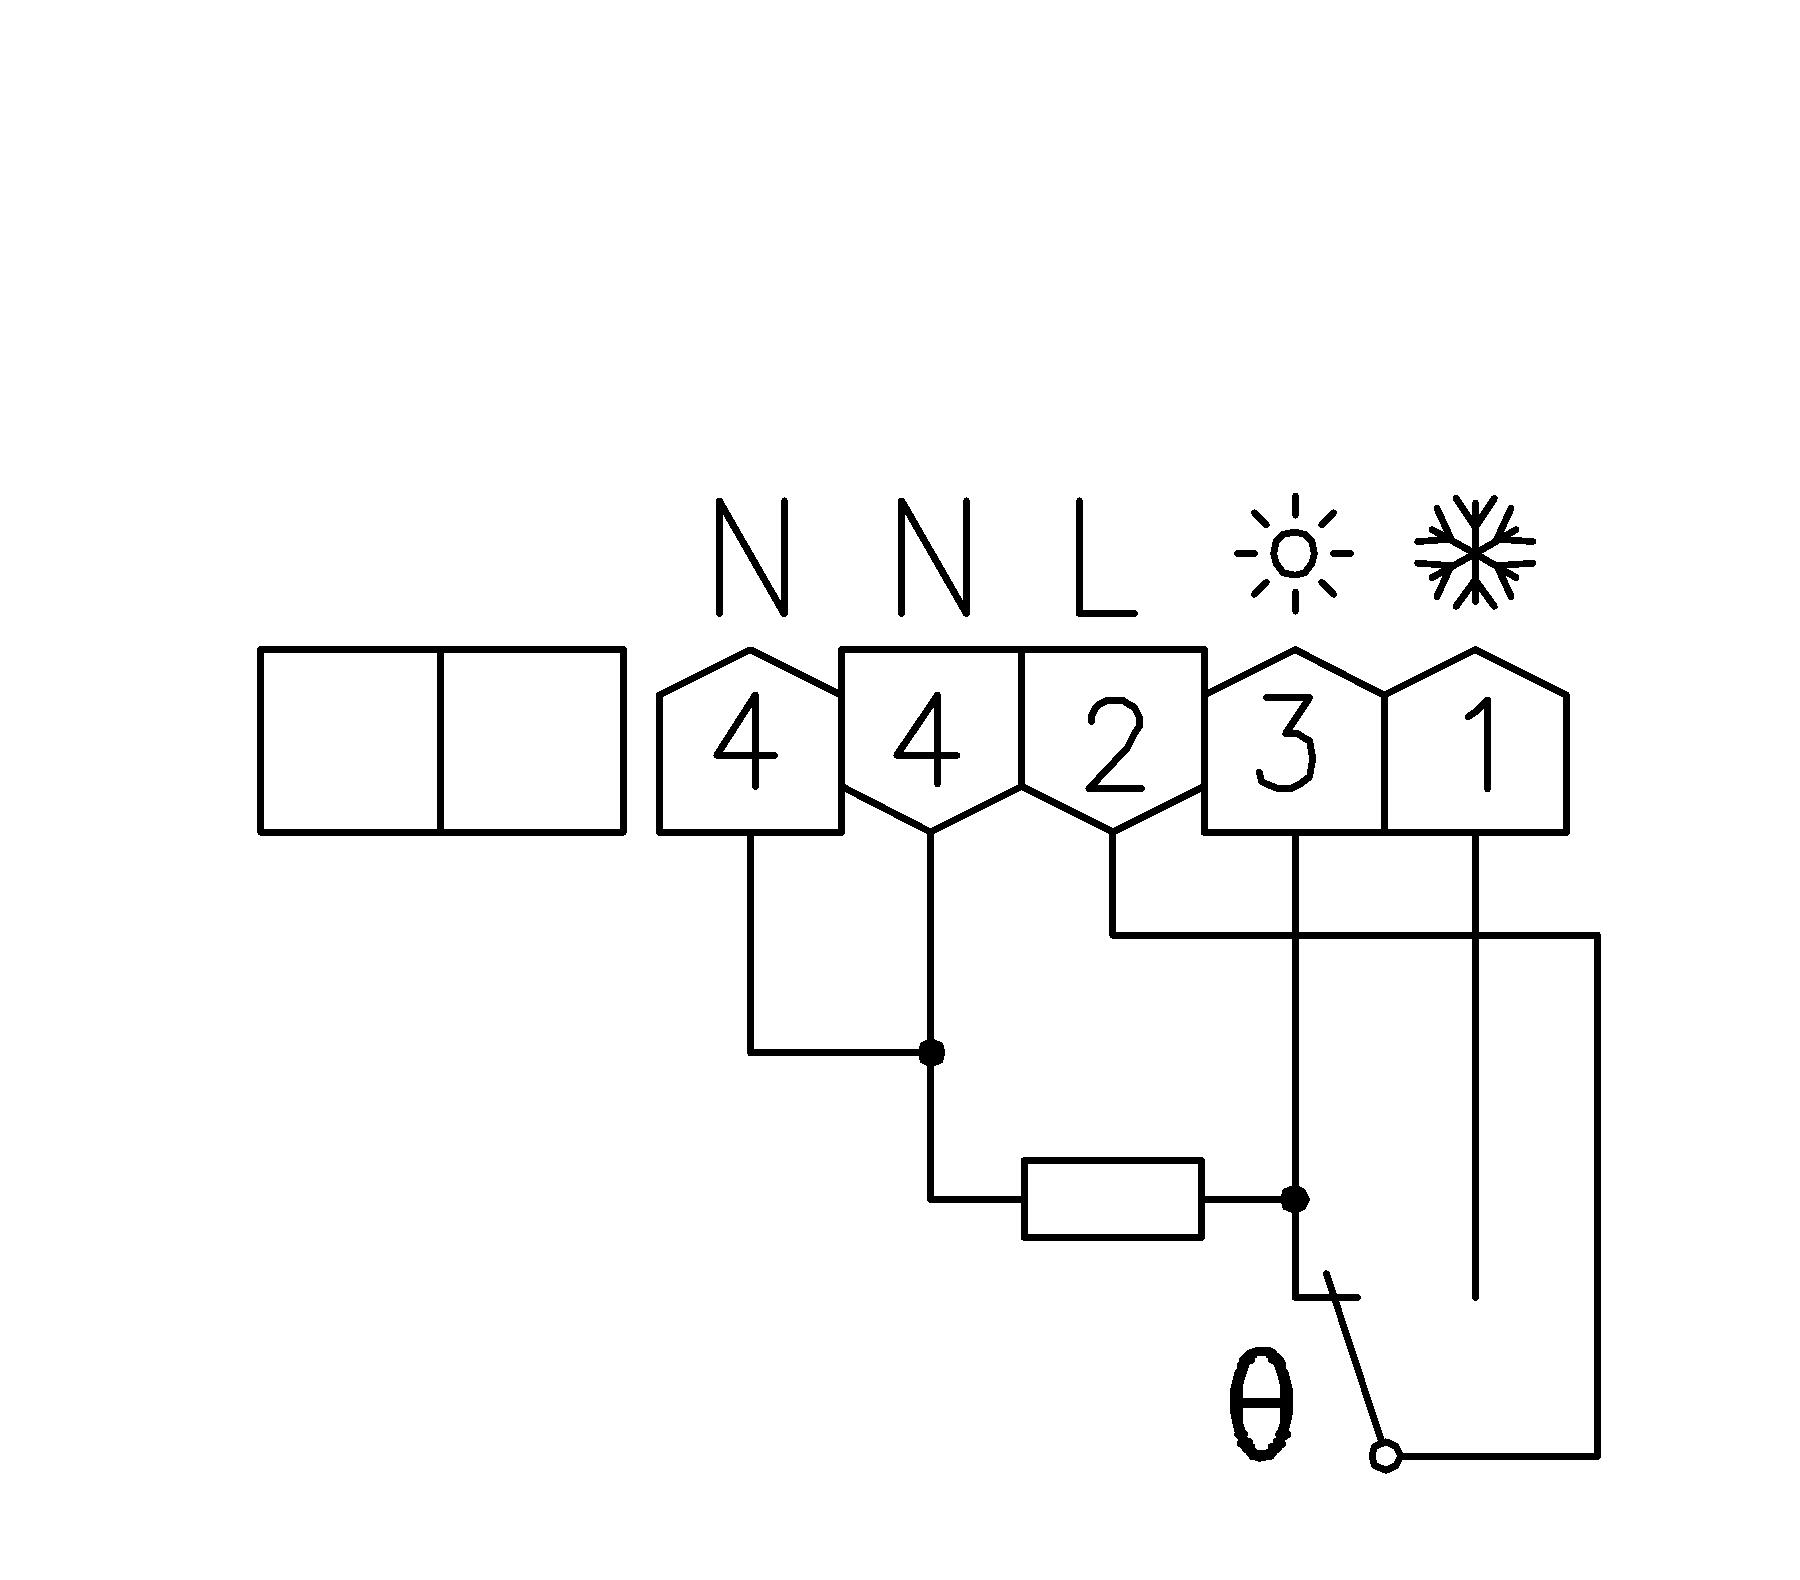 MA011200 Circuit diagram